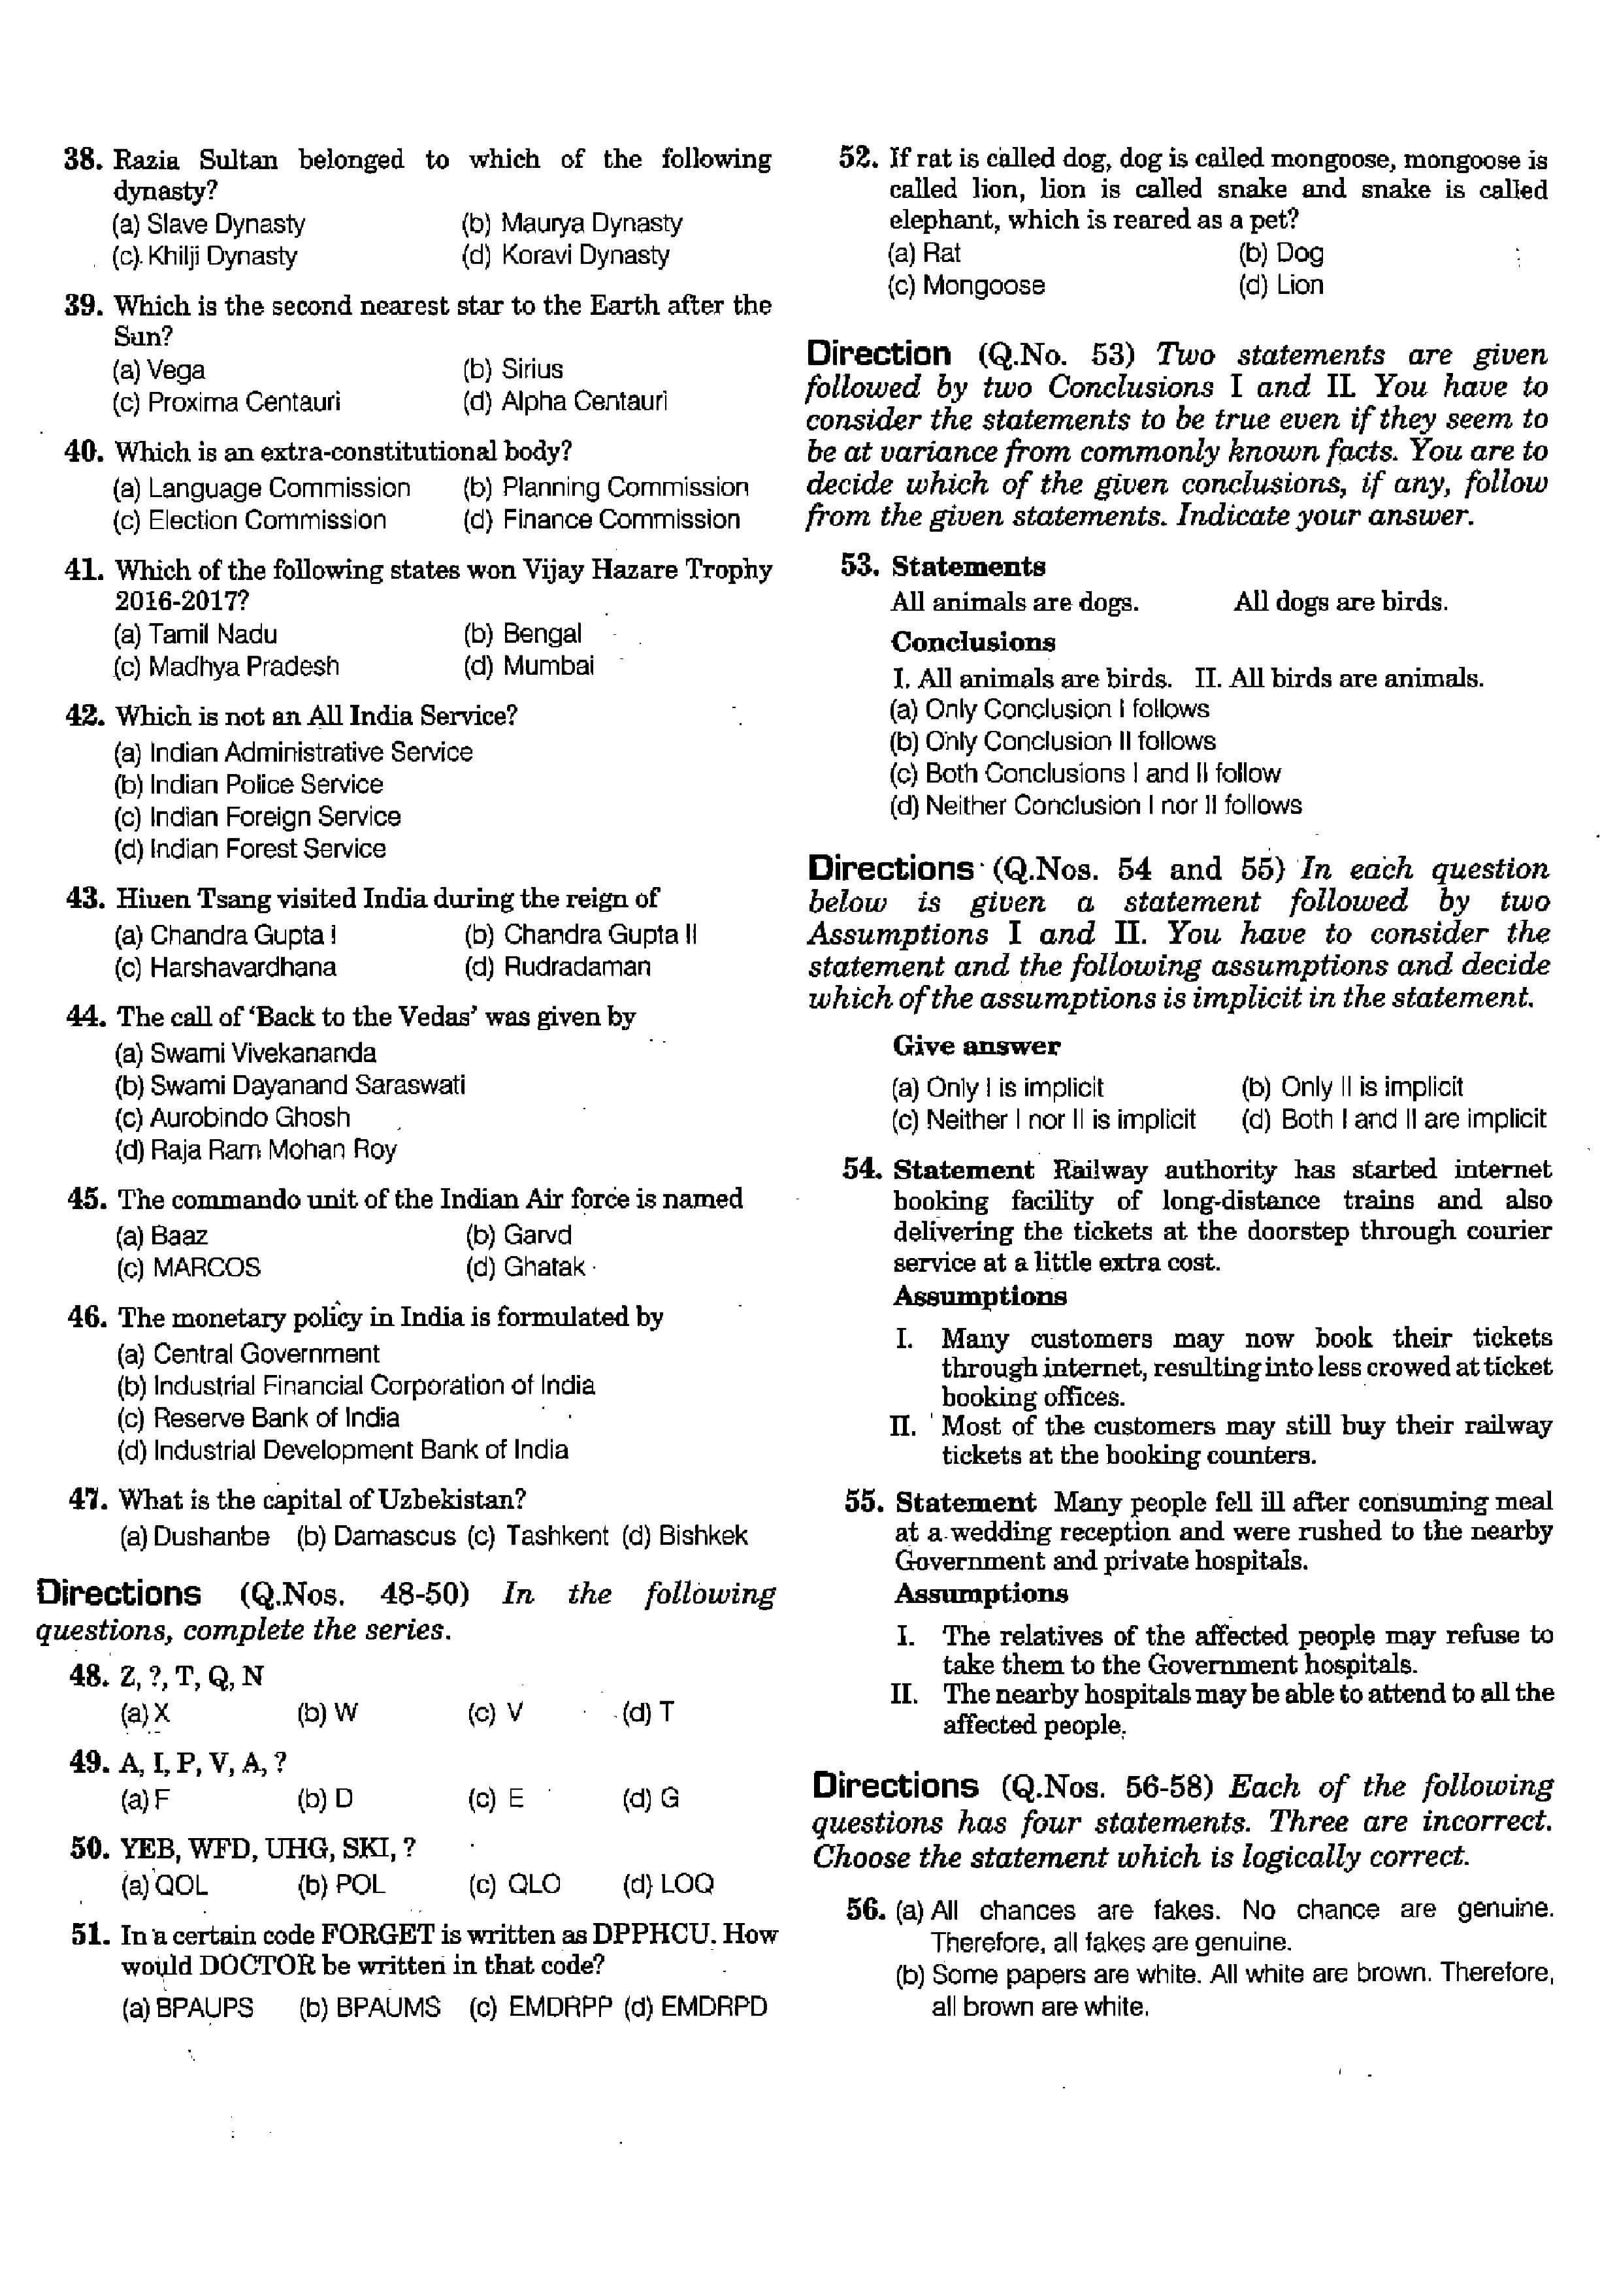 AFCAT 2 2020 Question Paper 03